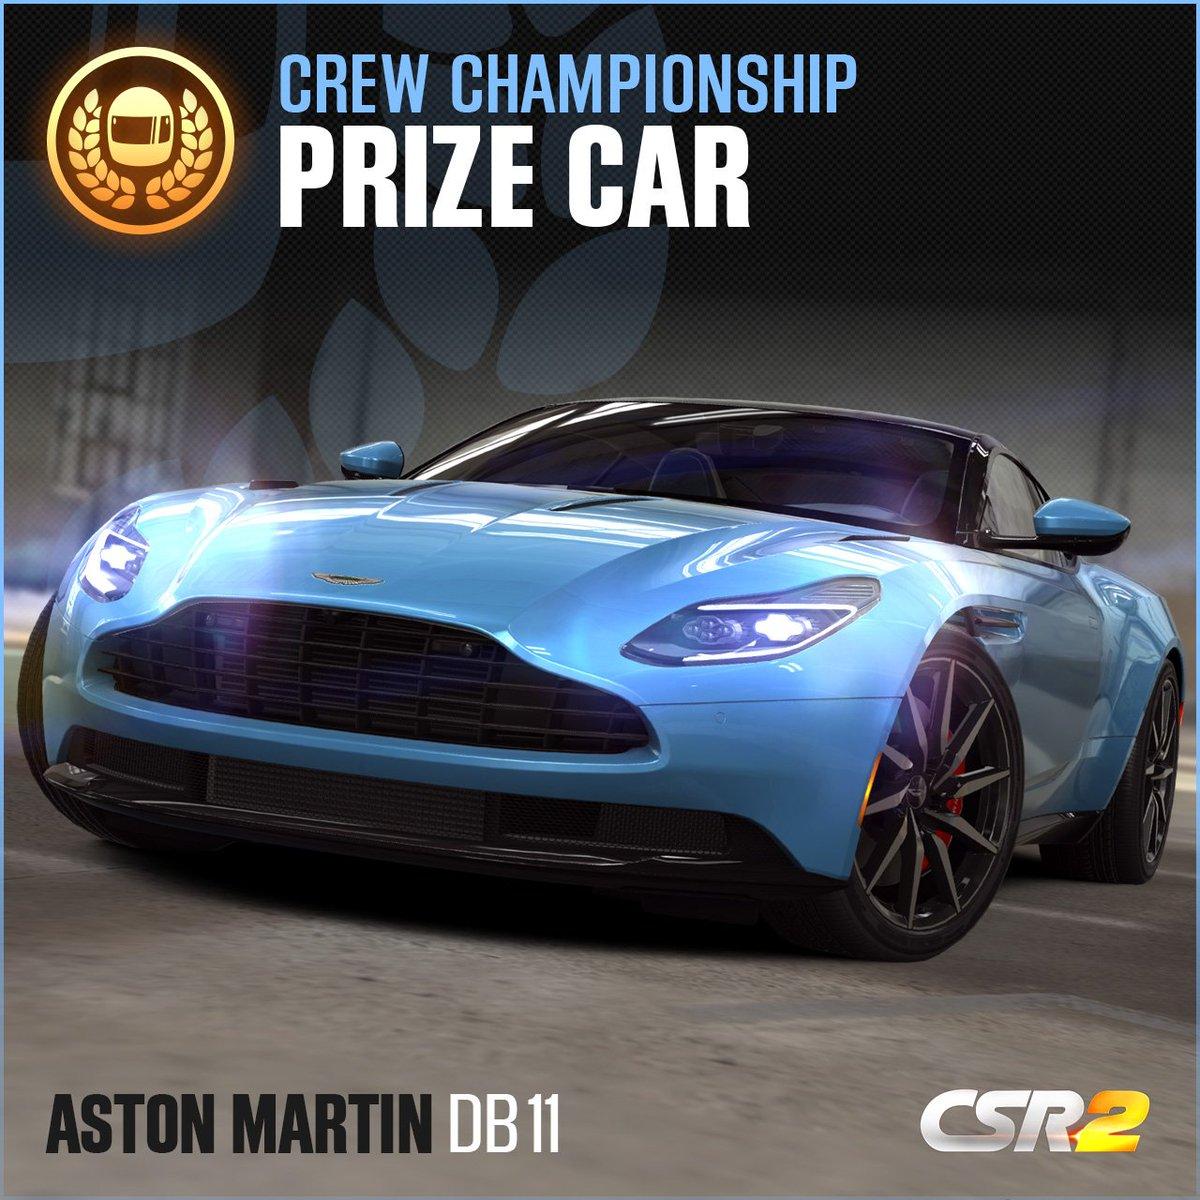 Csr Racing On Twitter Win The Unique Aston Martin Db11 In The New Crew Championship Csr2